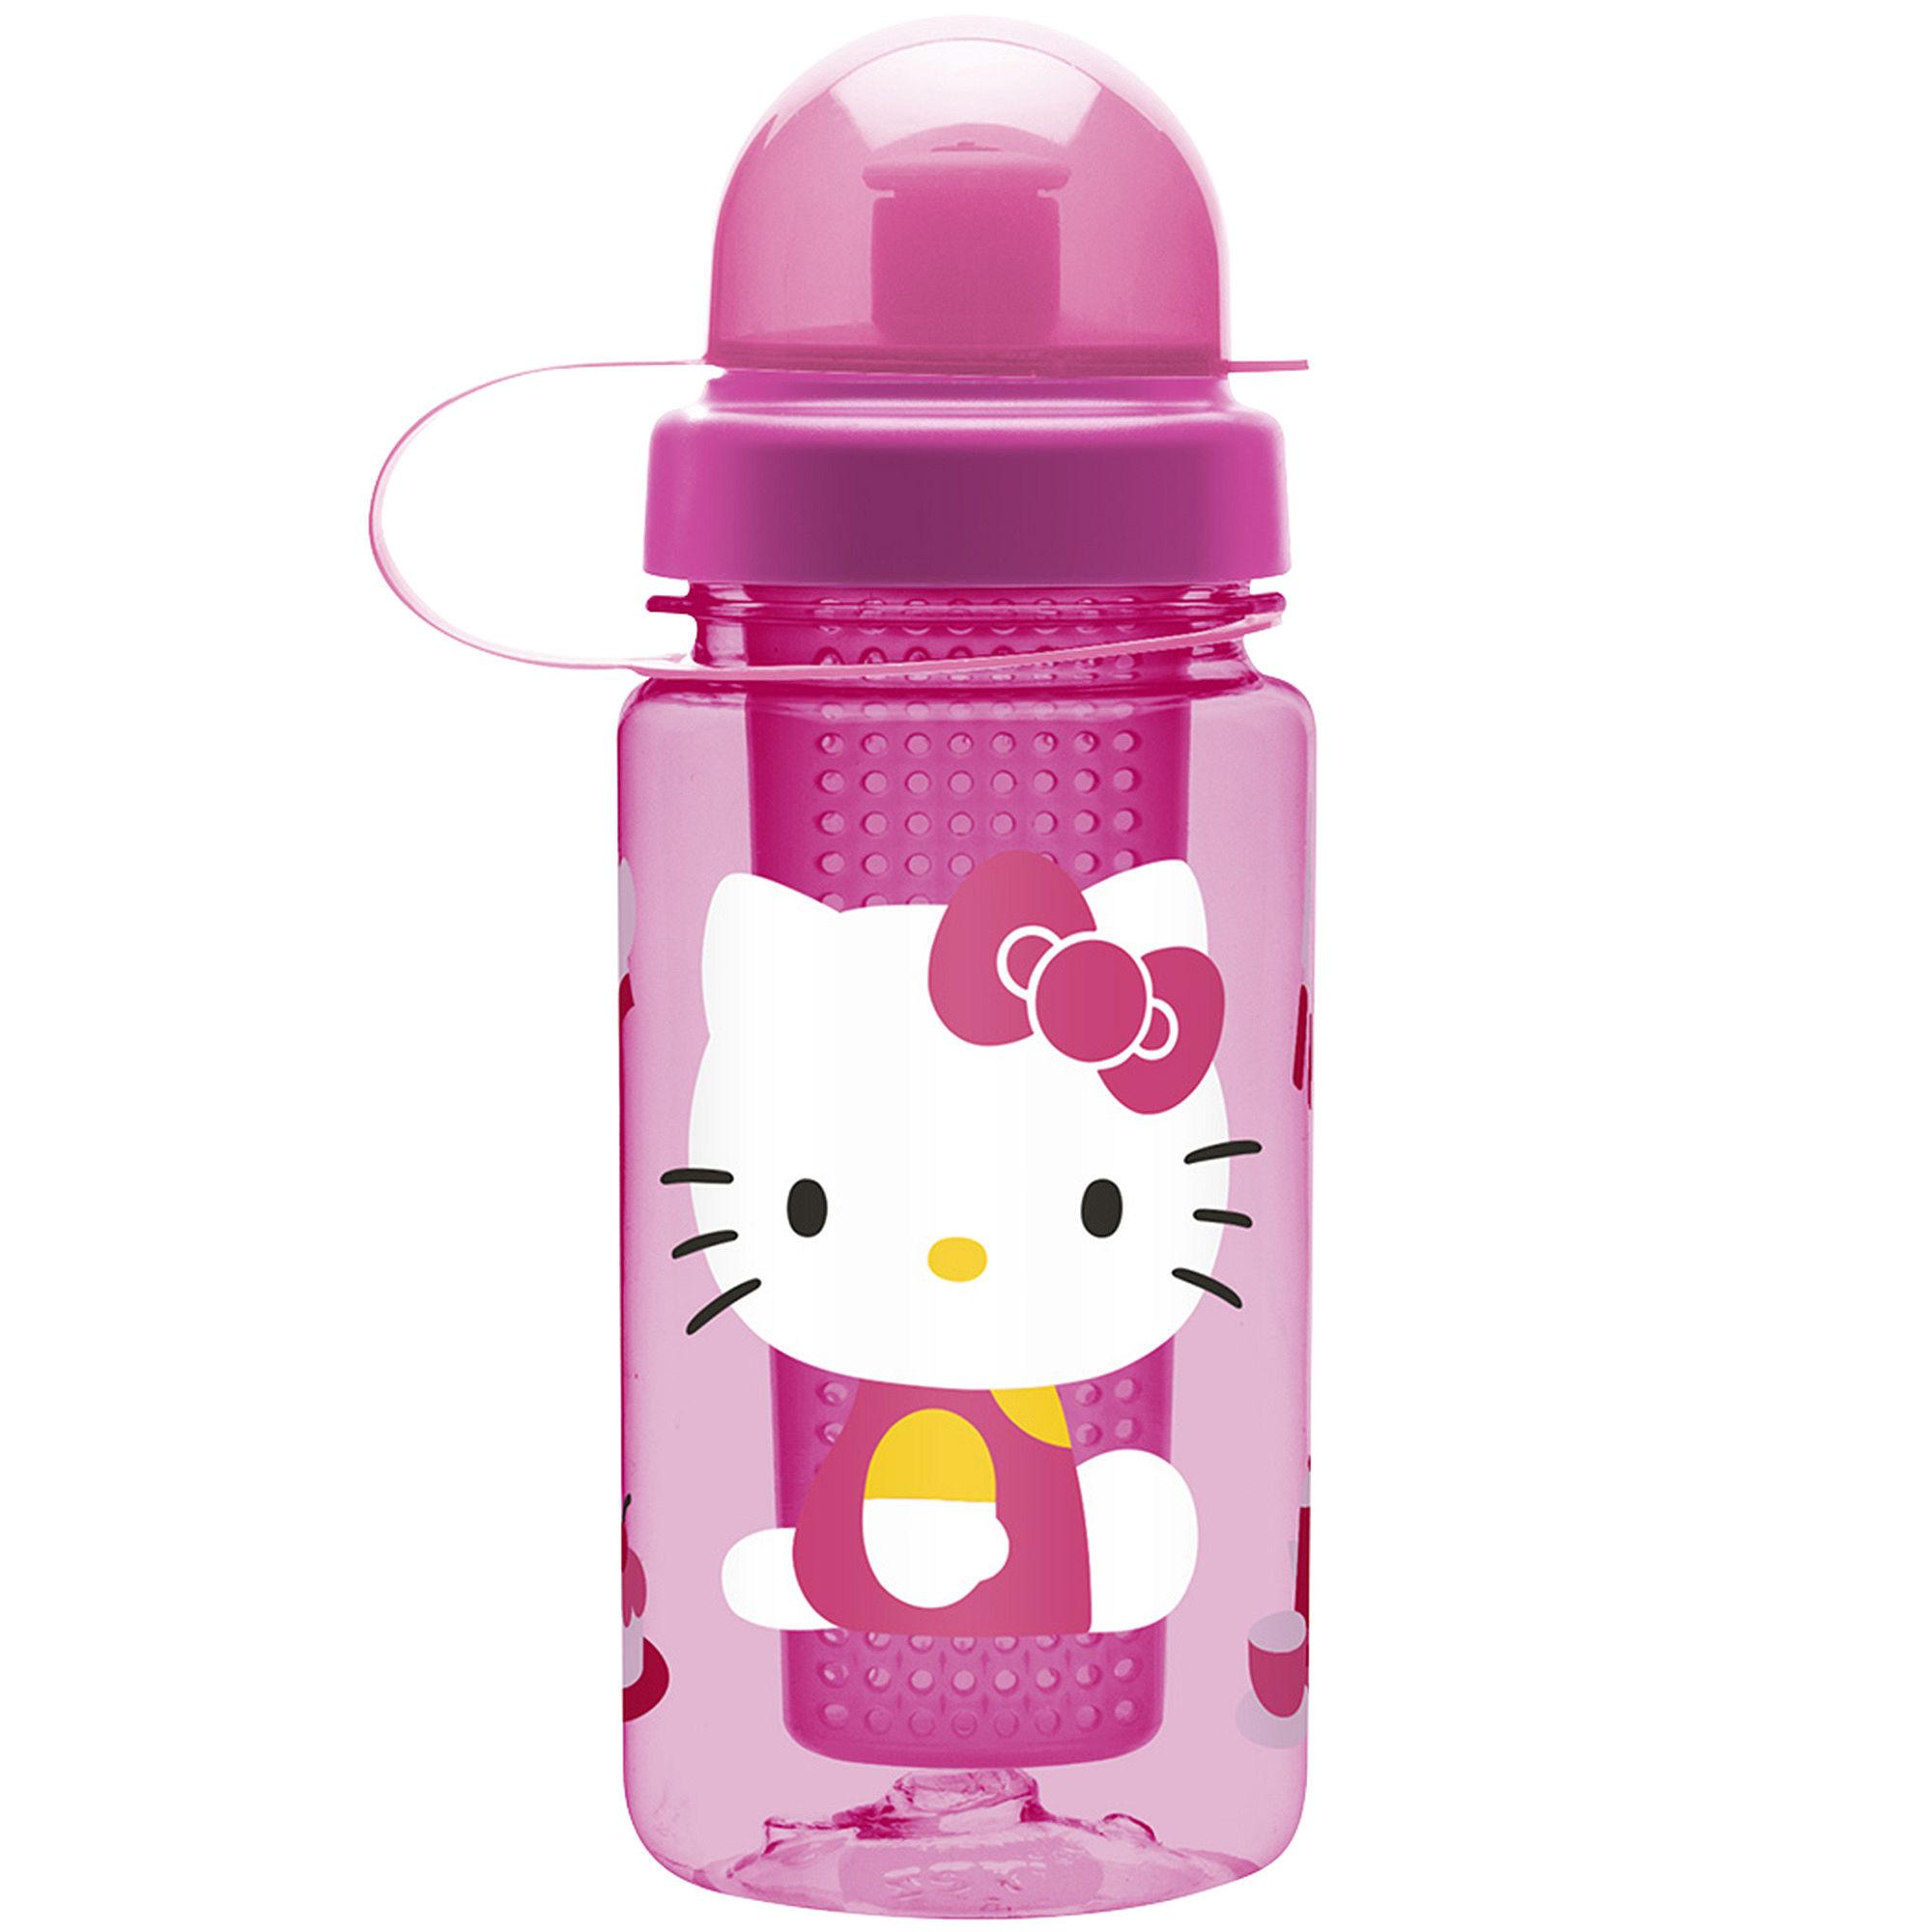 Zak Designs Hello Kitty 15-oz. Healthy by Design Infuser Bottle